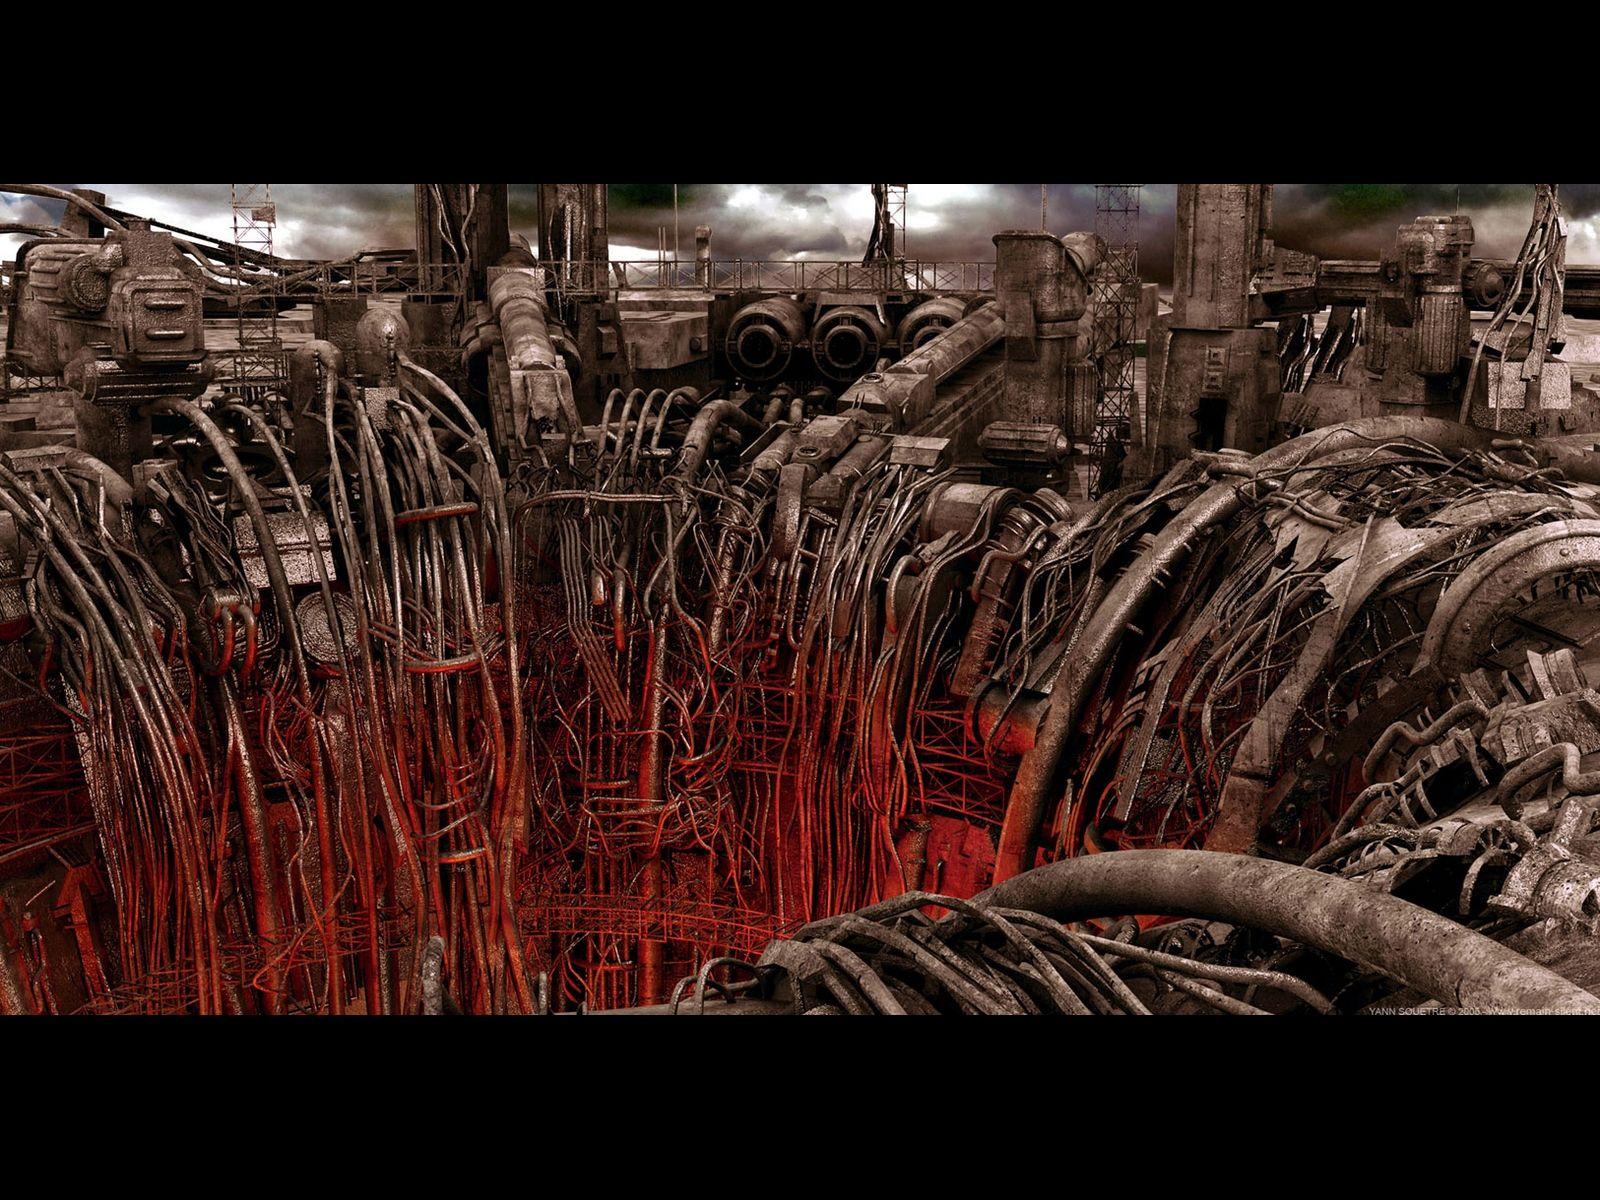 cyberpunk #198875   Science fiction artwork, Post apocalyptic art ...